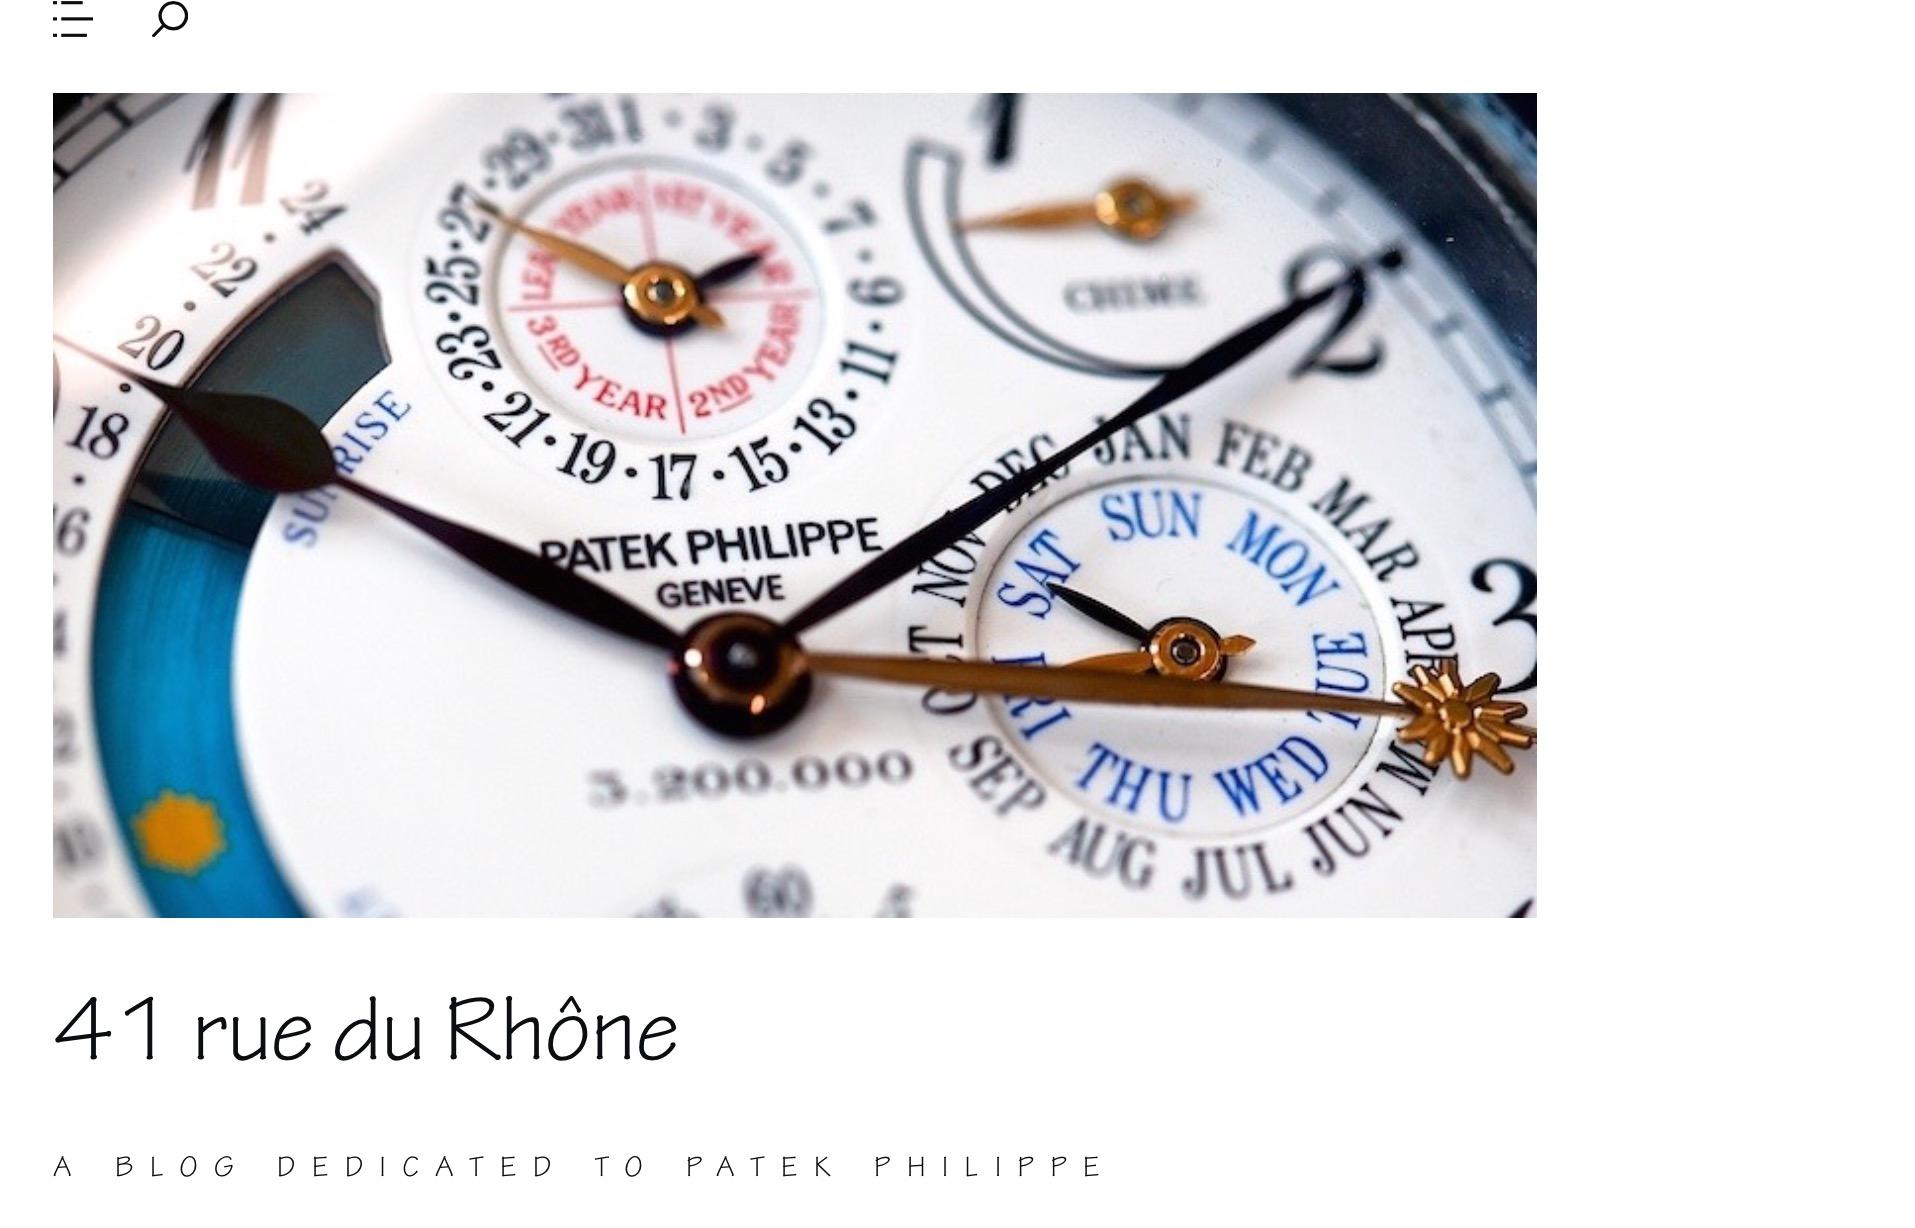 41 rue du Rhône – a blog dedicated to Patek Philippe